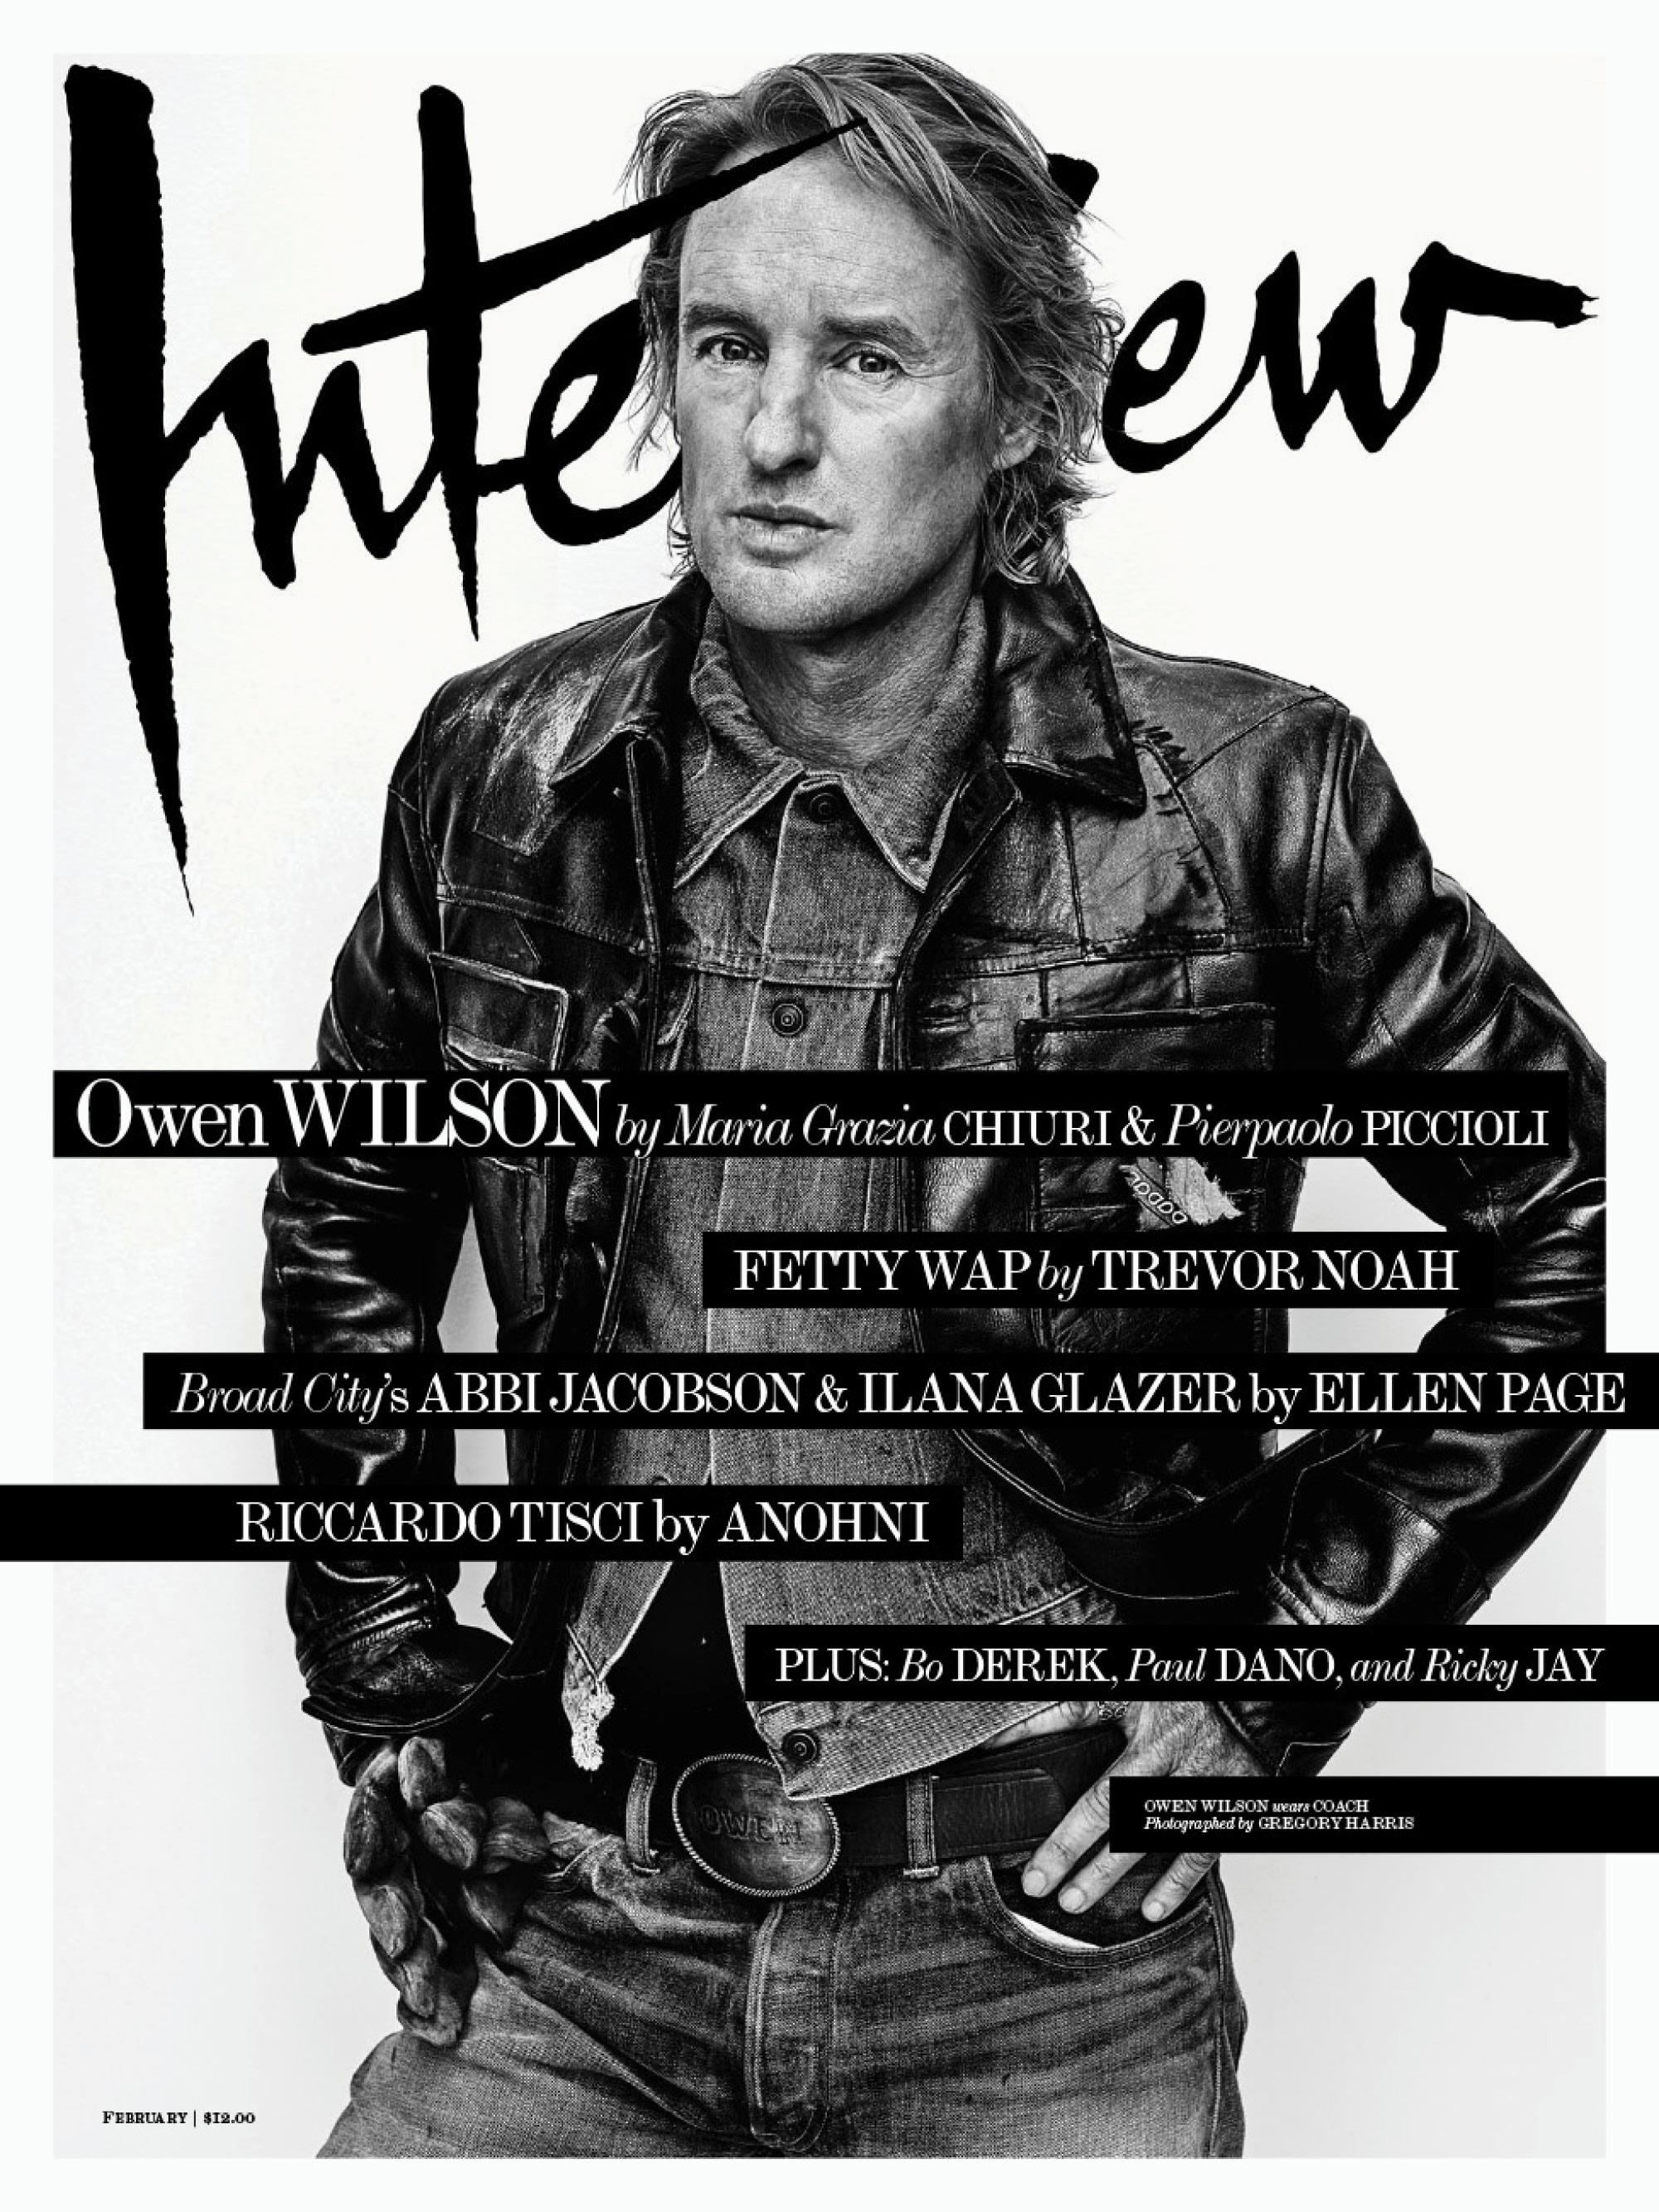 INTRVW1602_cover.jpg